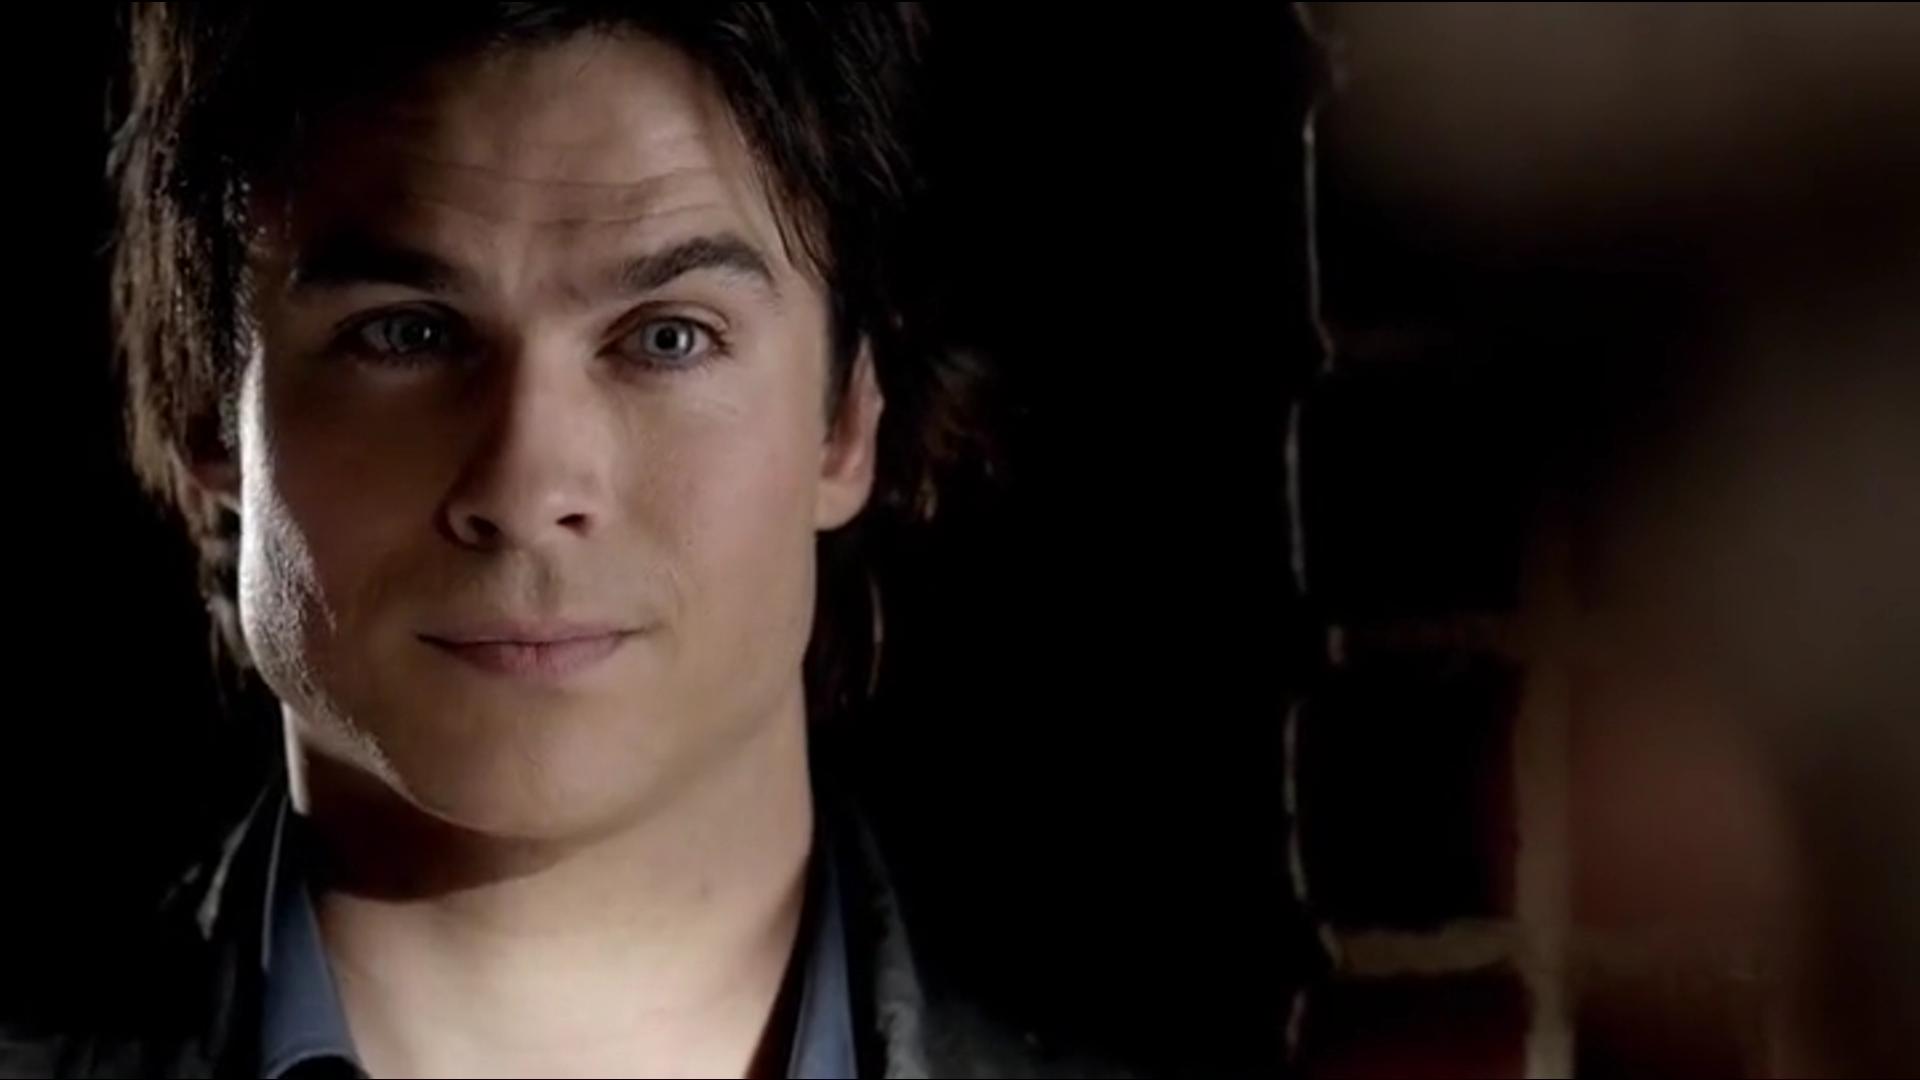 1 temporada the vampire diaries dublado online dating 5